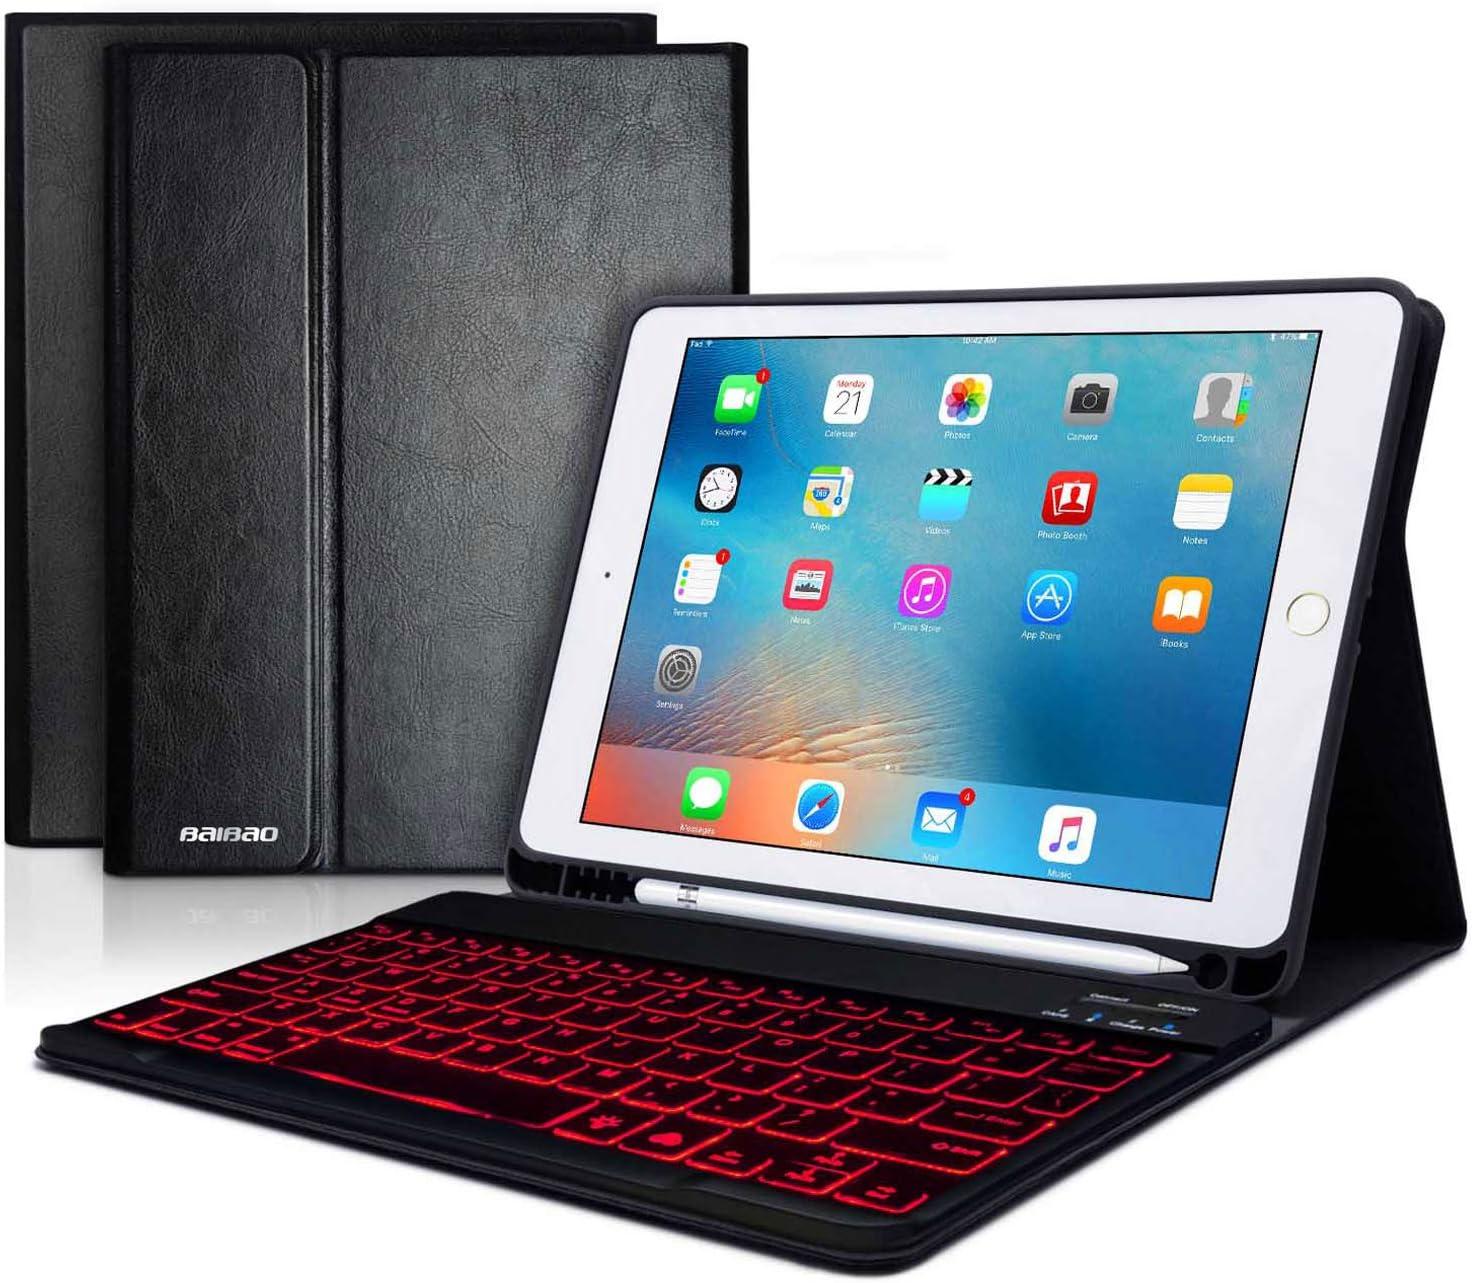 iPad 9.7 Keyboard Case for iPad 6th Gen 2018 -iPad 5th Gen 2017 -iPad Pro 9.7 -iPad Air 2&1 -Leather iPad Case with Backlit Keyboard and Pencil Holder-Removable Bluetooth Keyboard